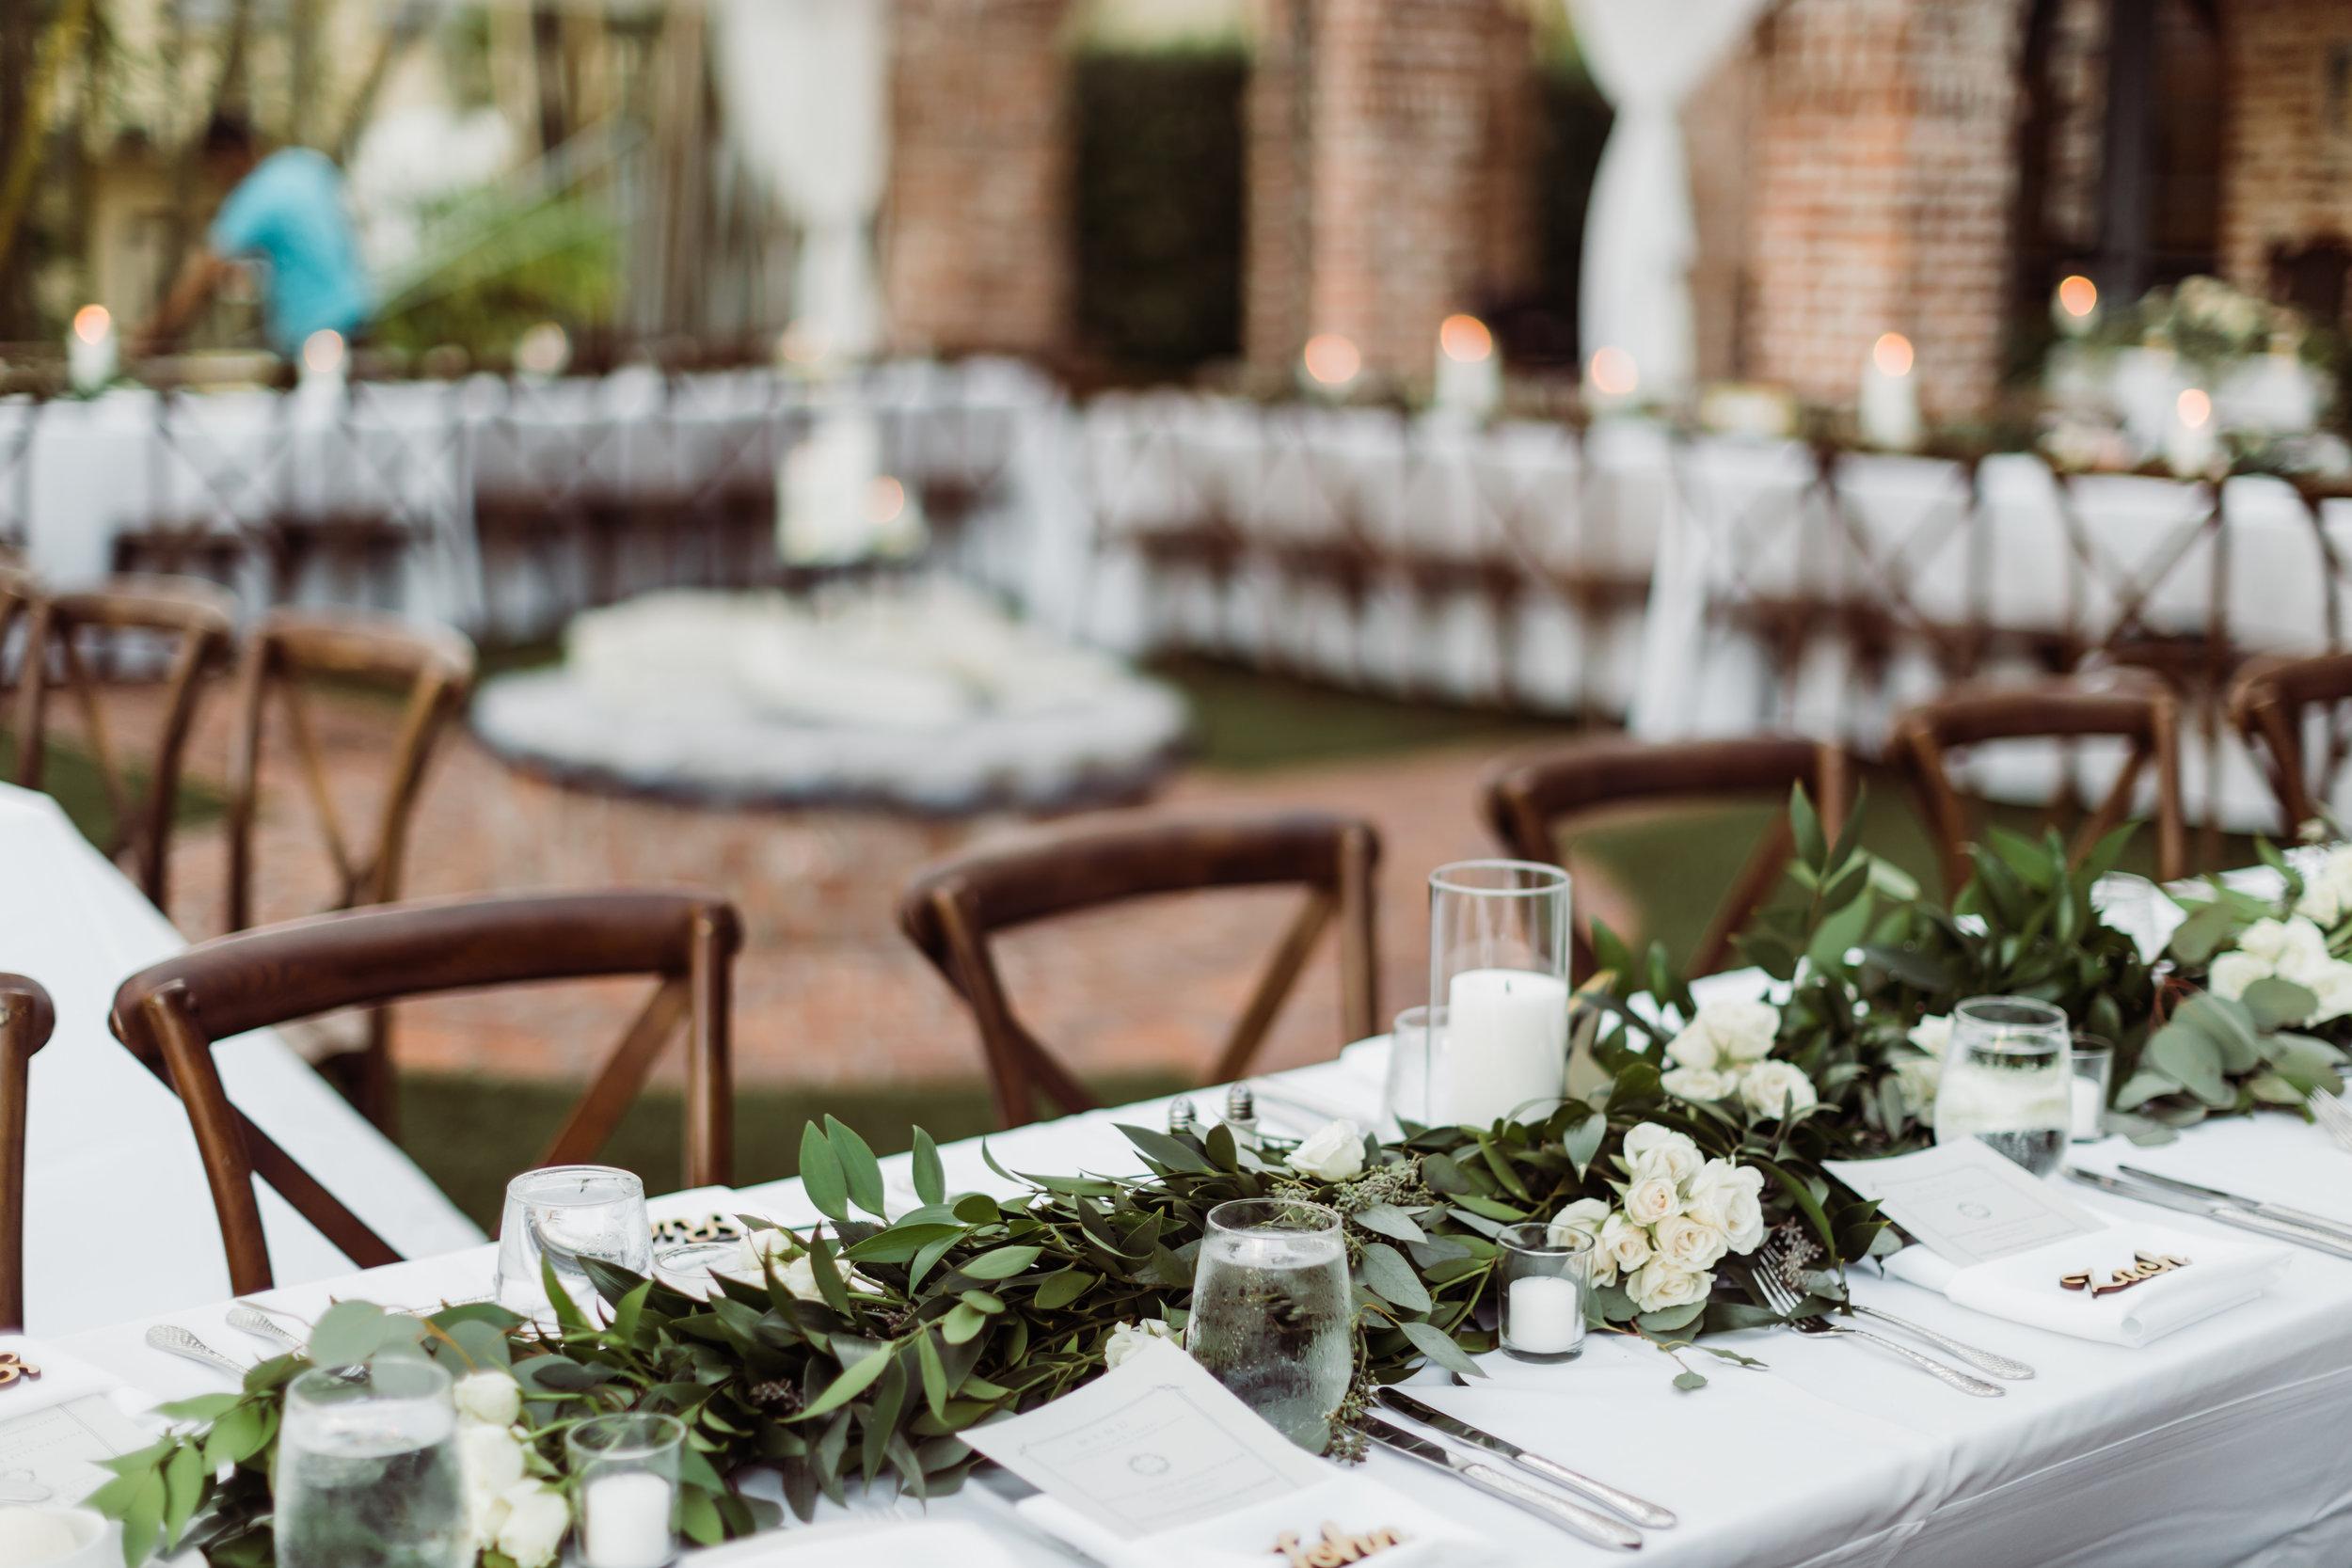 2017.10.15 Steffi and Elliott Simmonds Casa Feliz Wedding (637 of 969).jpg